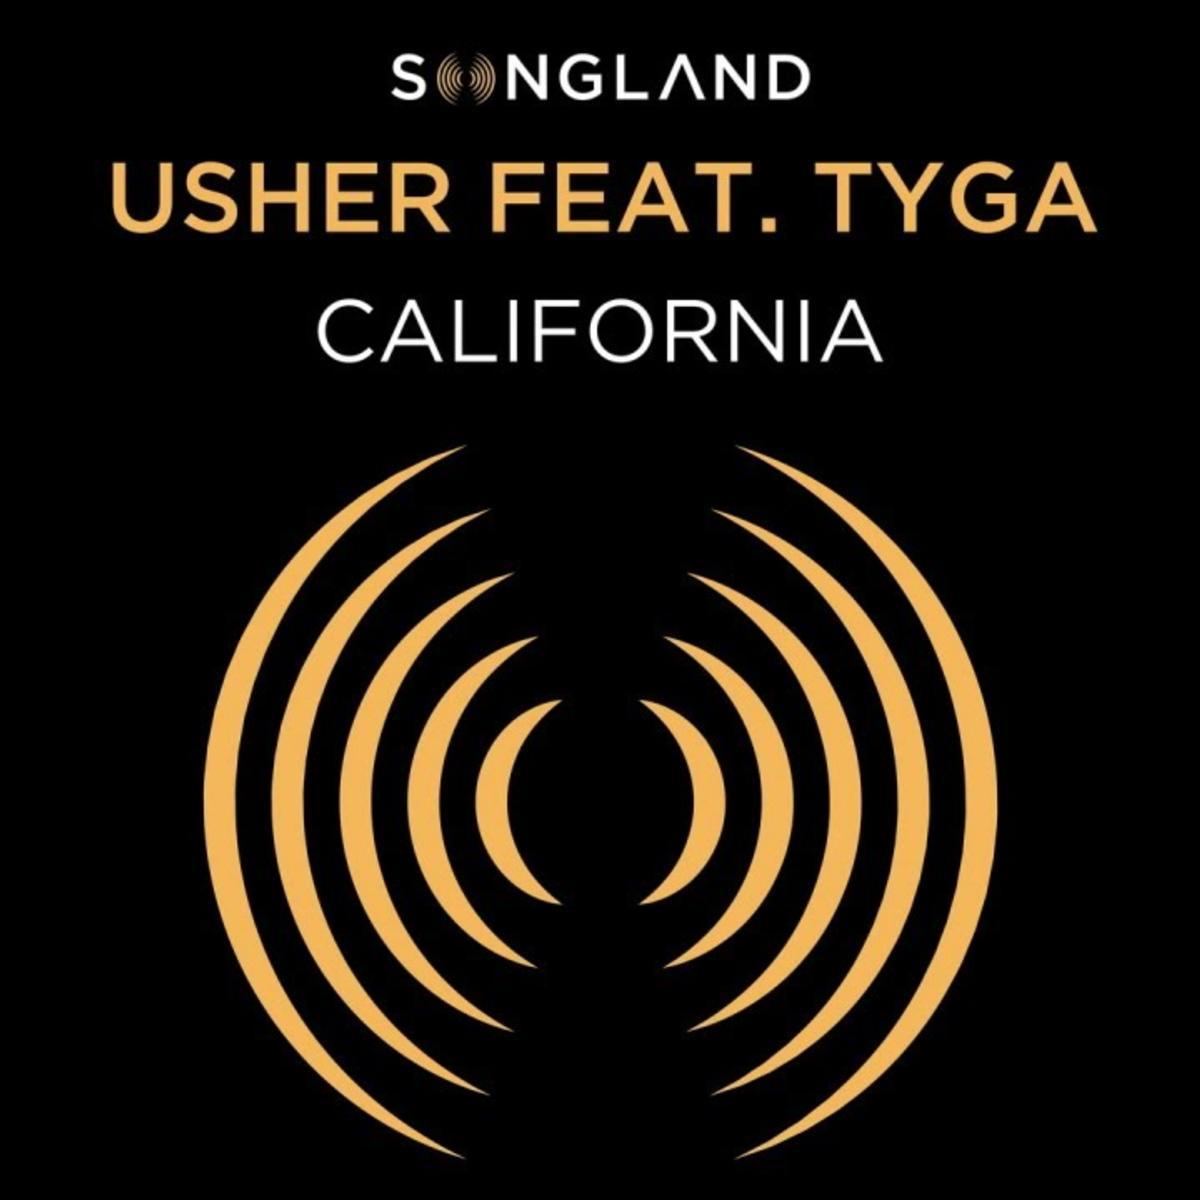 Usher - California (from Songland) Ft. Tyga